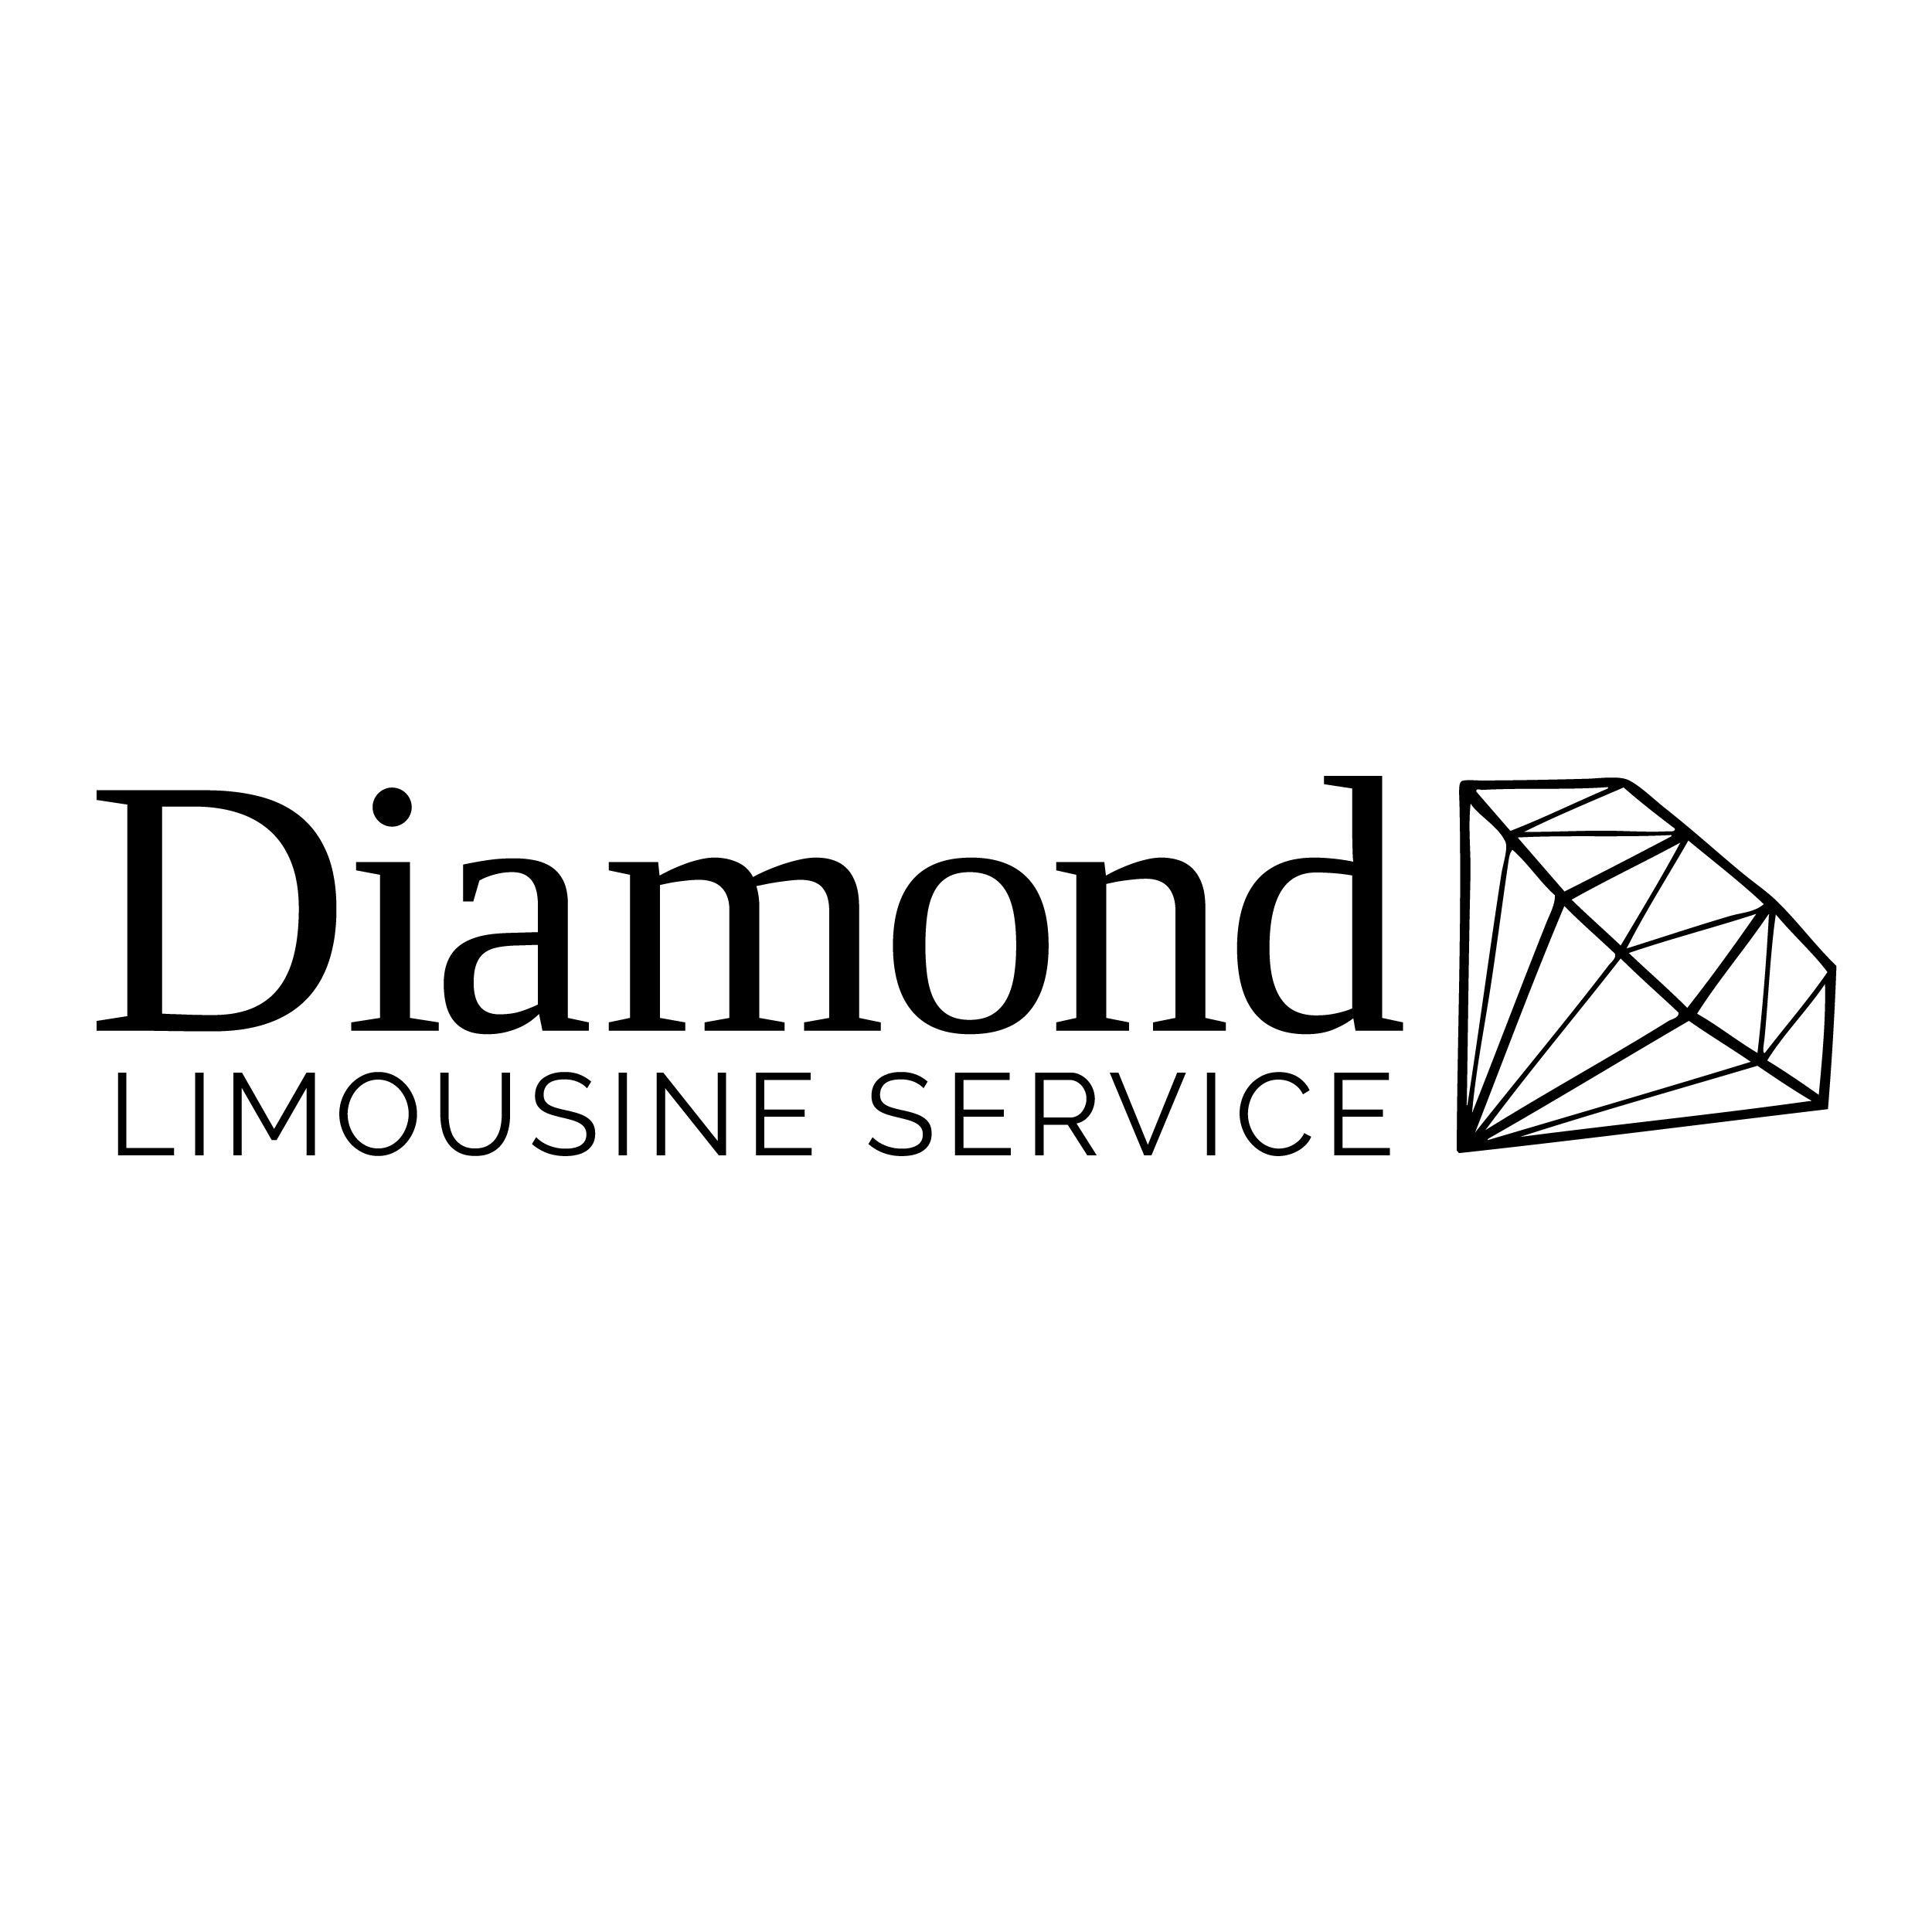 Diamond Limousine